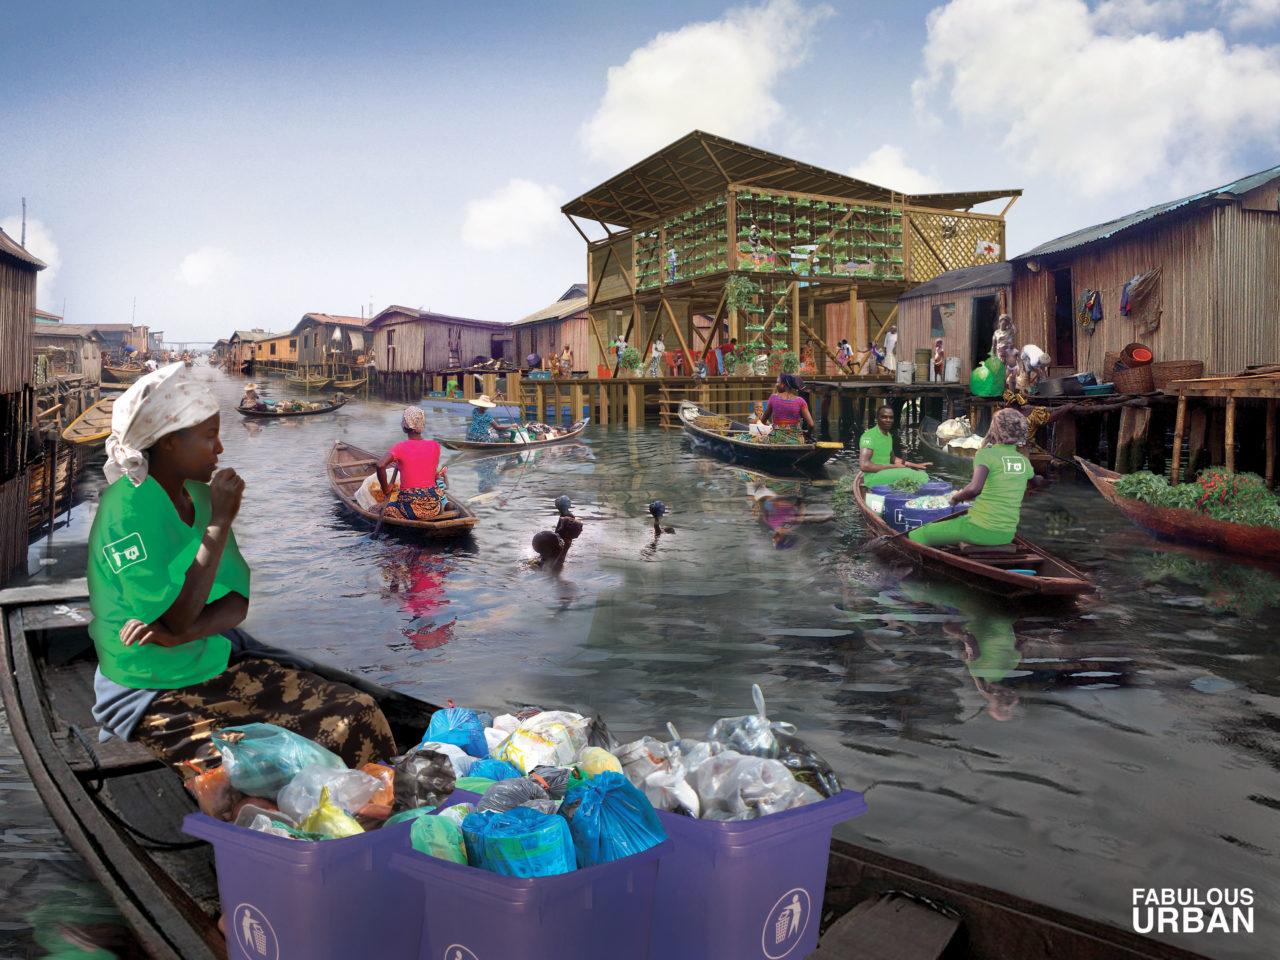 NL22: Neighborhood Hotspots and Waste Incubators as part of the Makoko Regeneration Plan